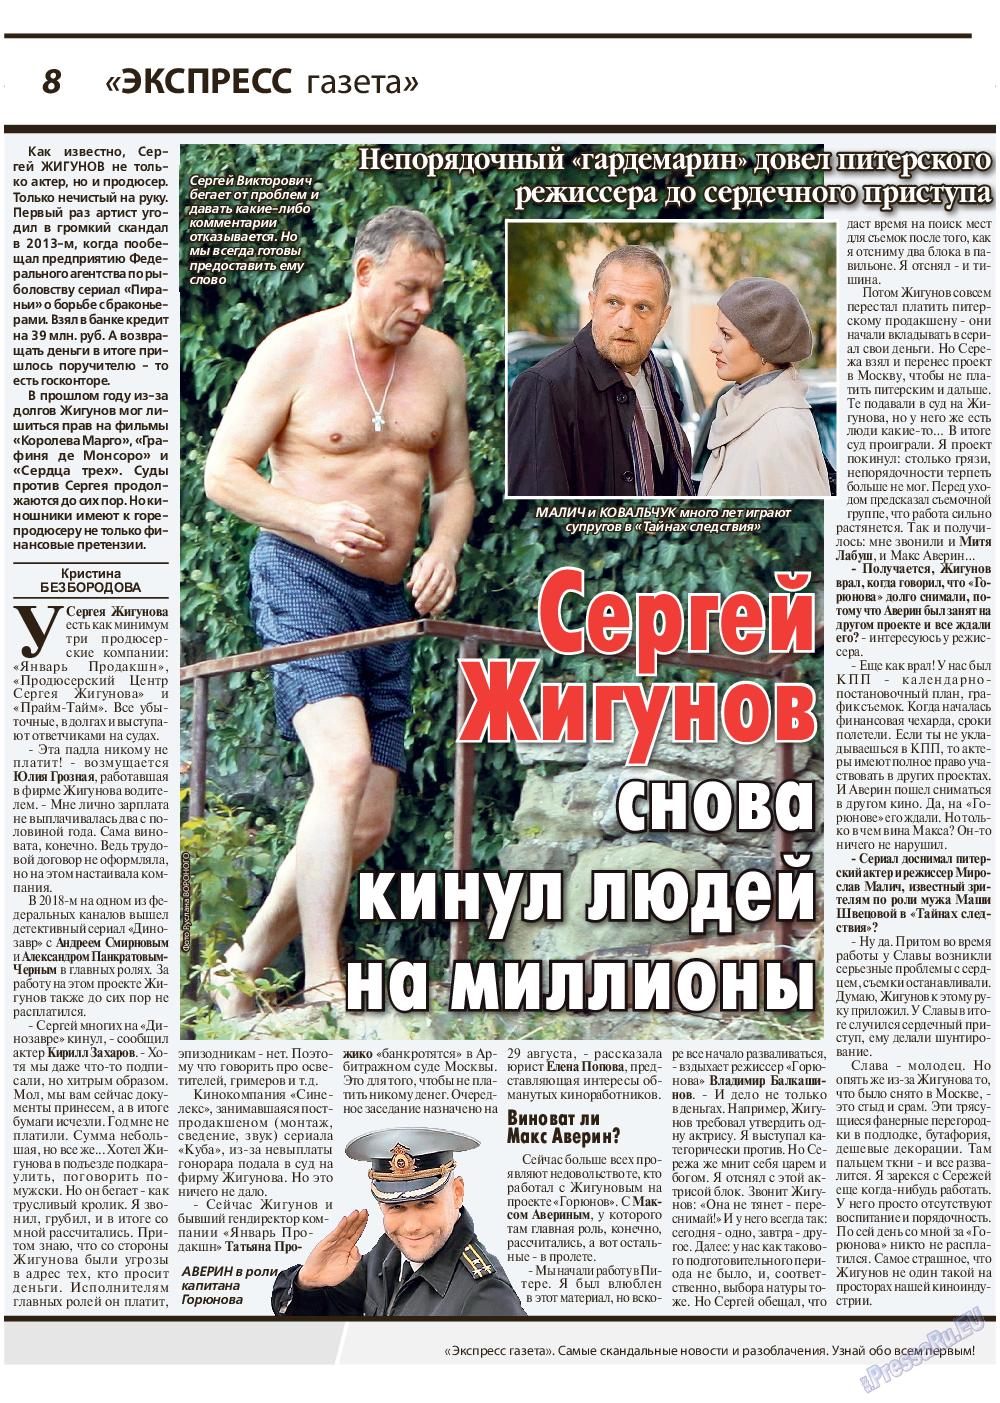 Экспресс газета (газета). 2020 год, номер 1, стр. 8